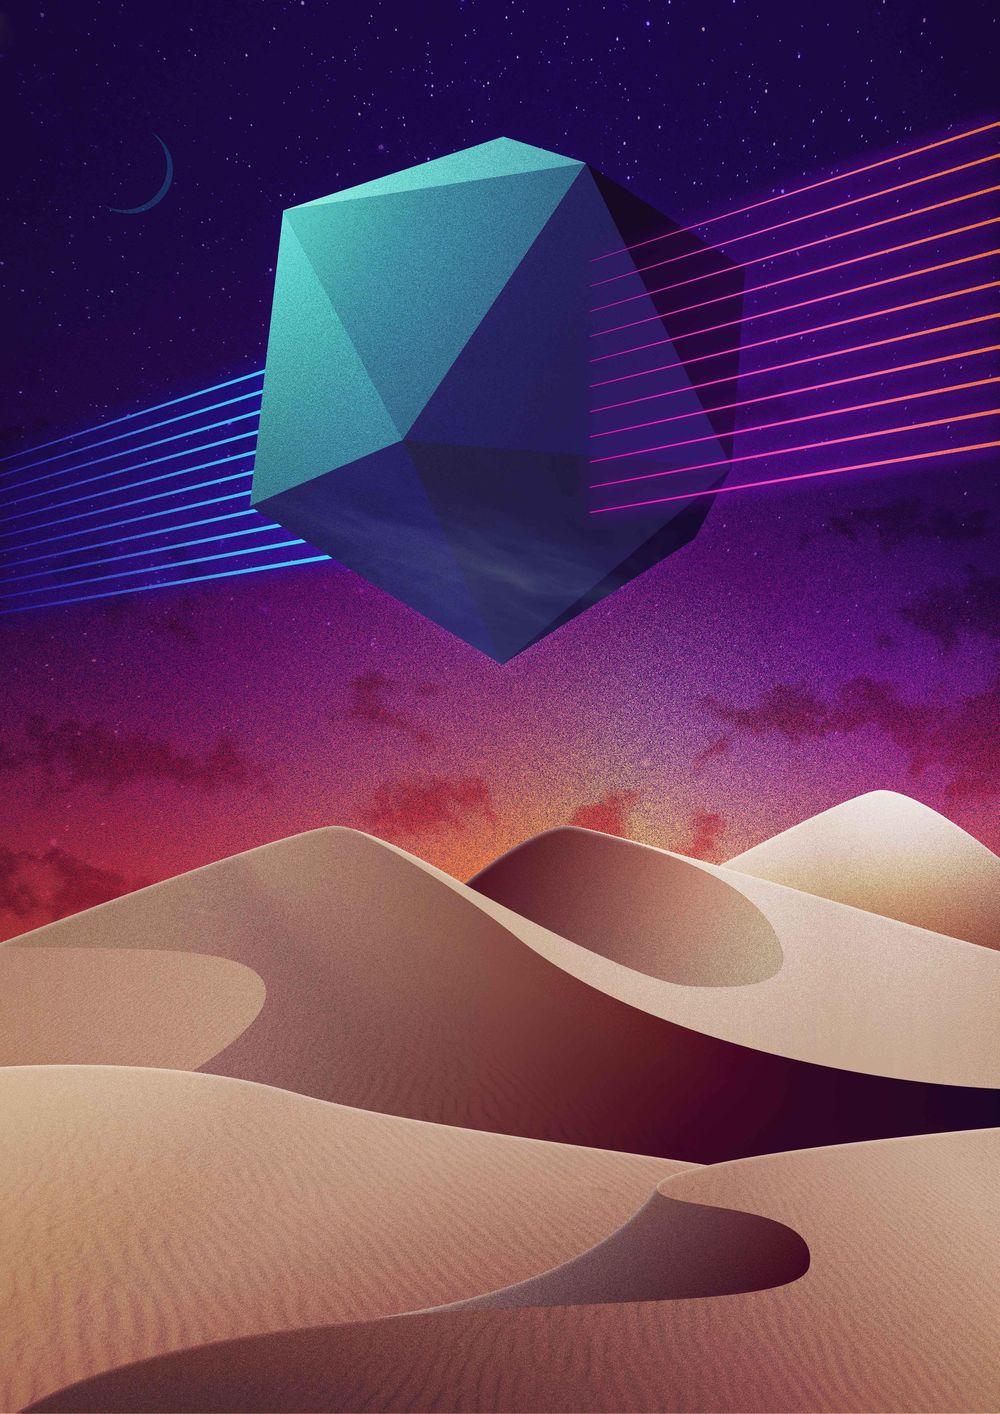 Sparkling desert - image 1 - student project